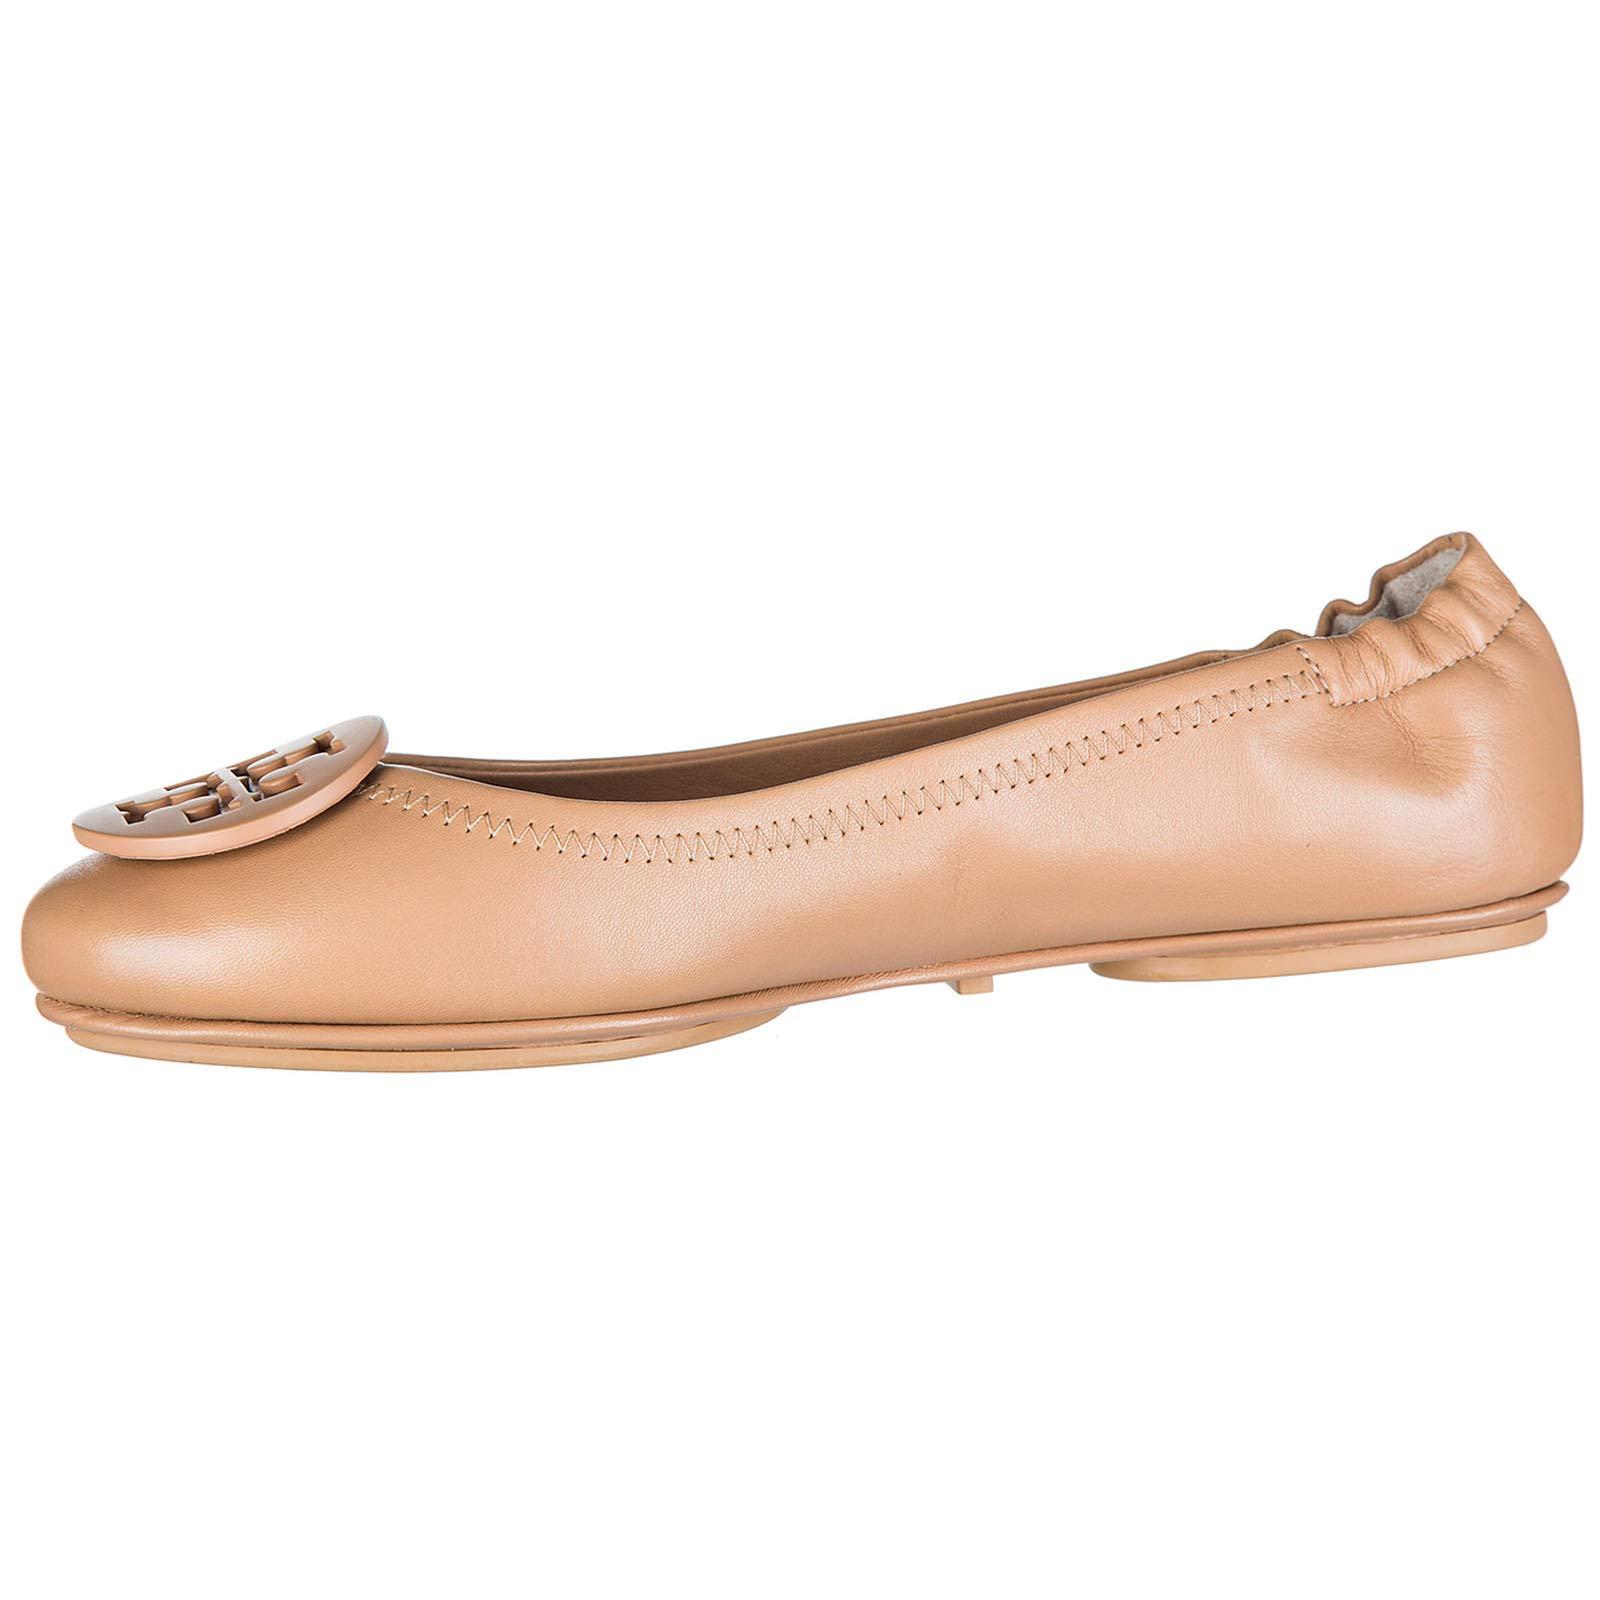 Tory Burch Women's Leather Ballet Flats Ballerinas Minnie Brown US Size 7.5 51158251254 image https://media.buyr.com/yFlfHexwLYGqNP6QWtlKqw--mjNSMGk9T_PCXwk52beRA.jpg1